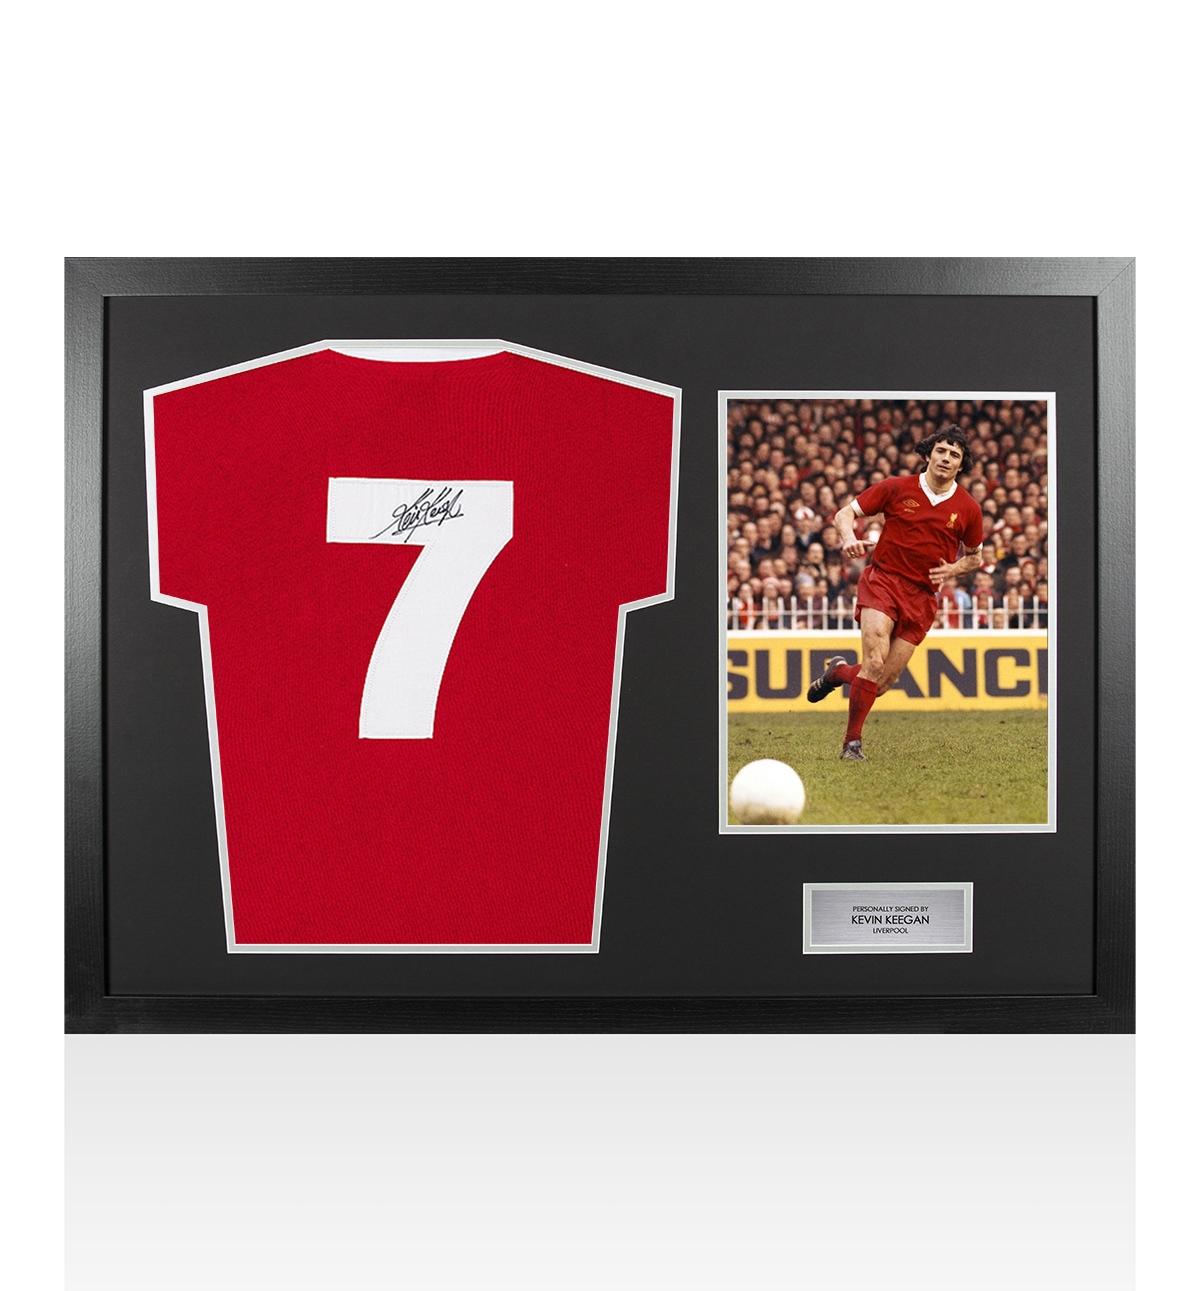 detailed look a0160 266a0 Retro Liverpool Shirt Ebay - DREAMWORKS